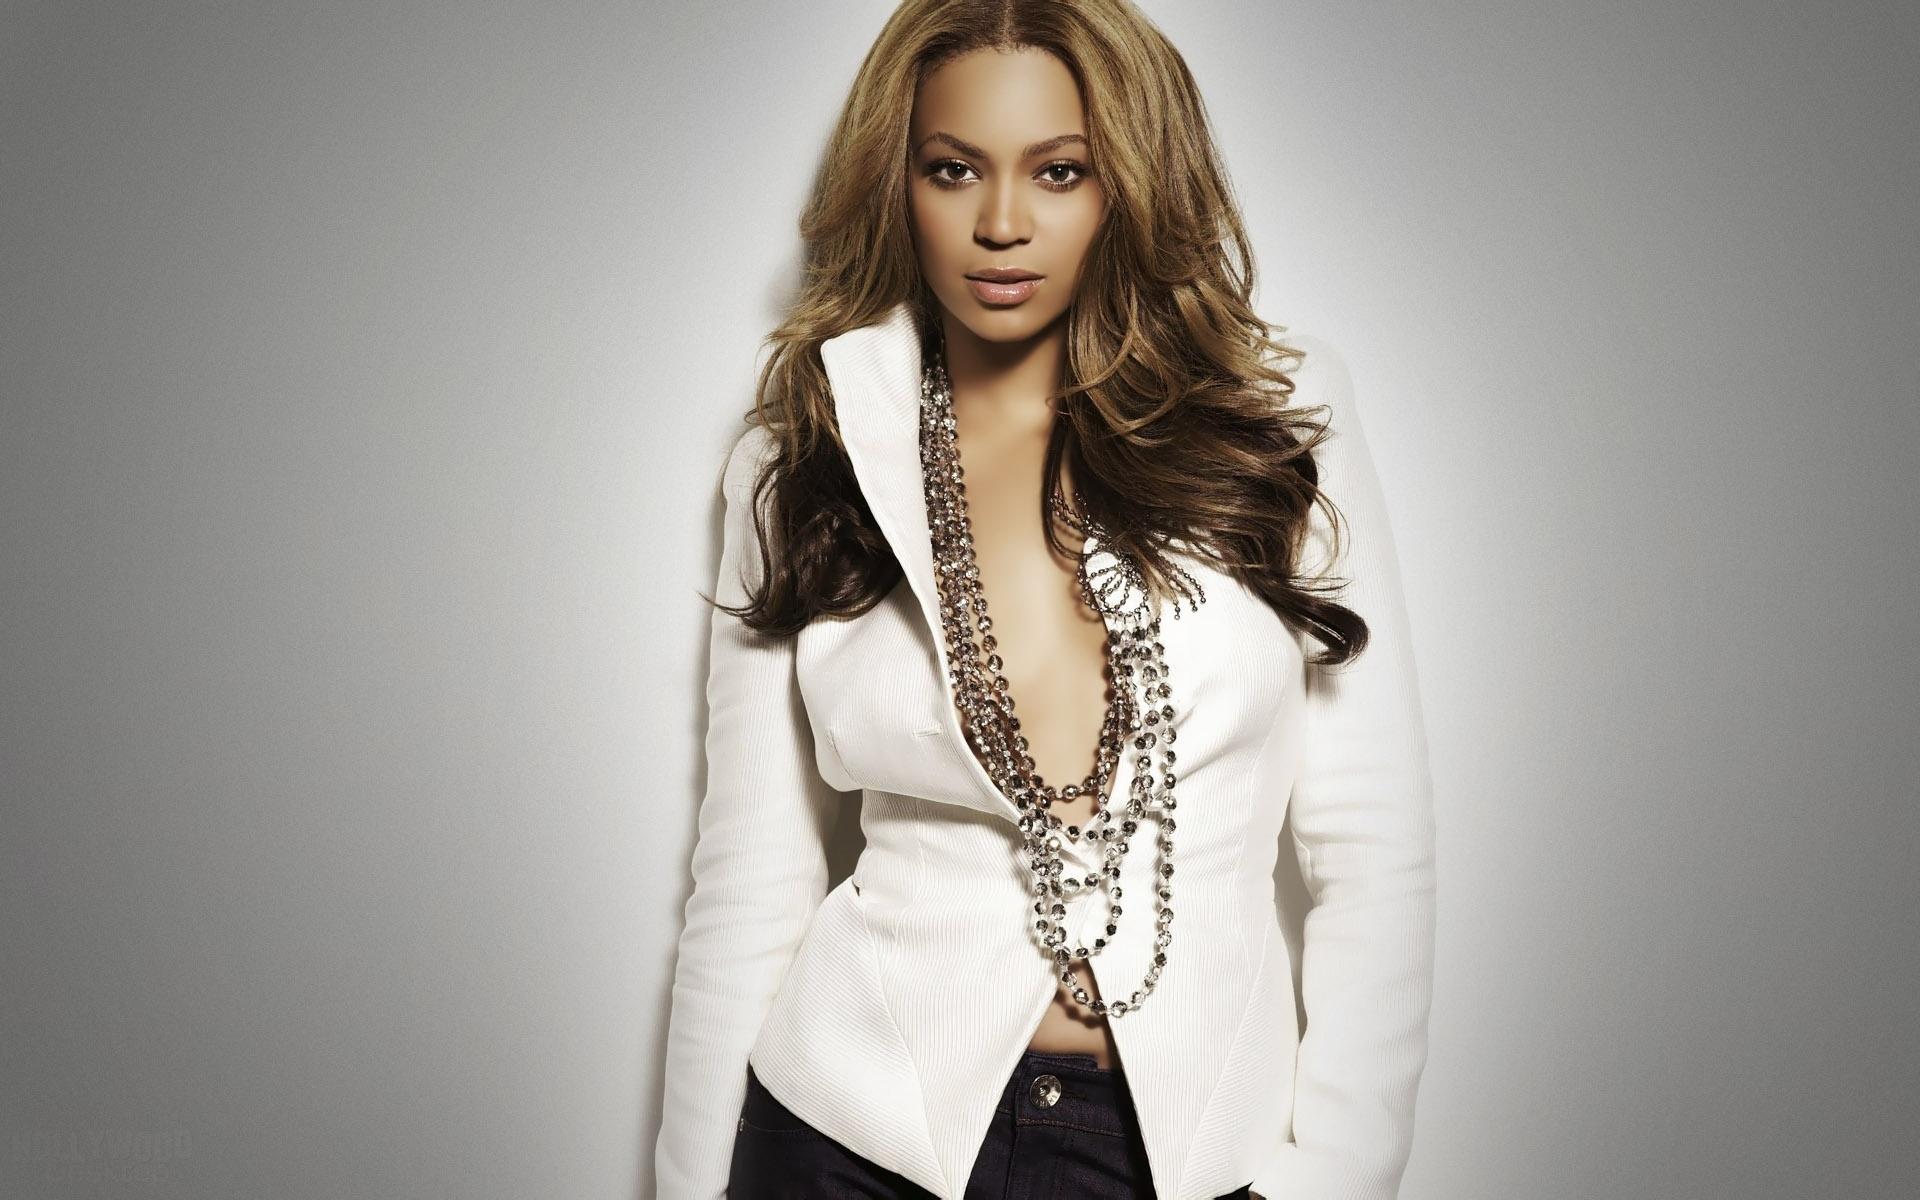 HD Wallpapers Beyonce Knowles 9